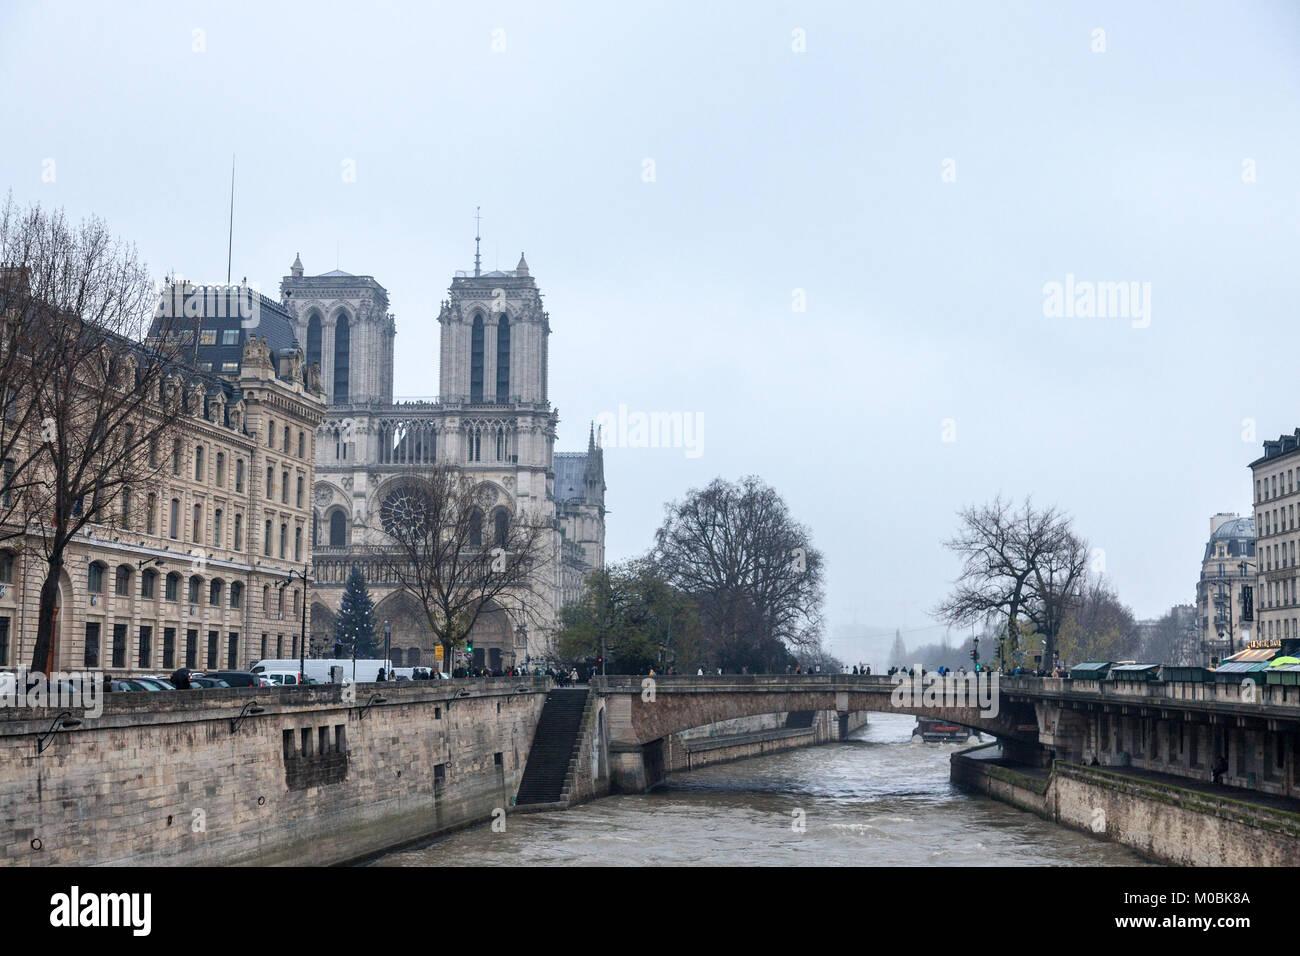 PARIS, FRANCE - DECEMBER 20, 2017:  Notre Dame de Paris Cathedral taken from the Seine river with the Double bridge - Stock Image